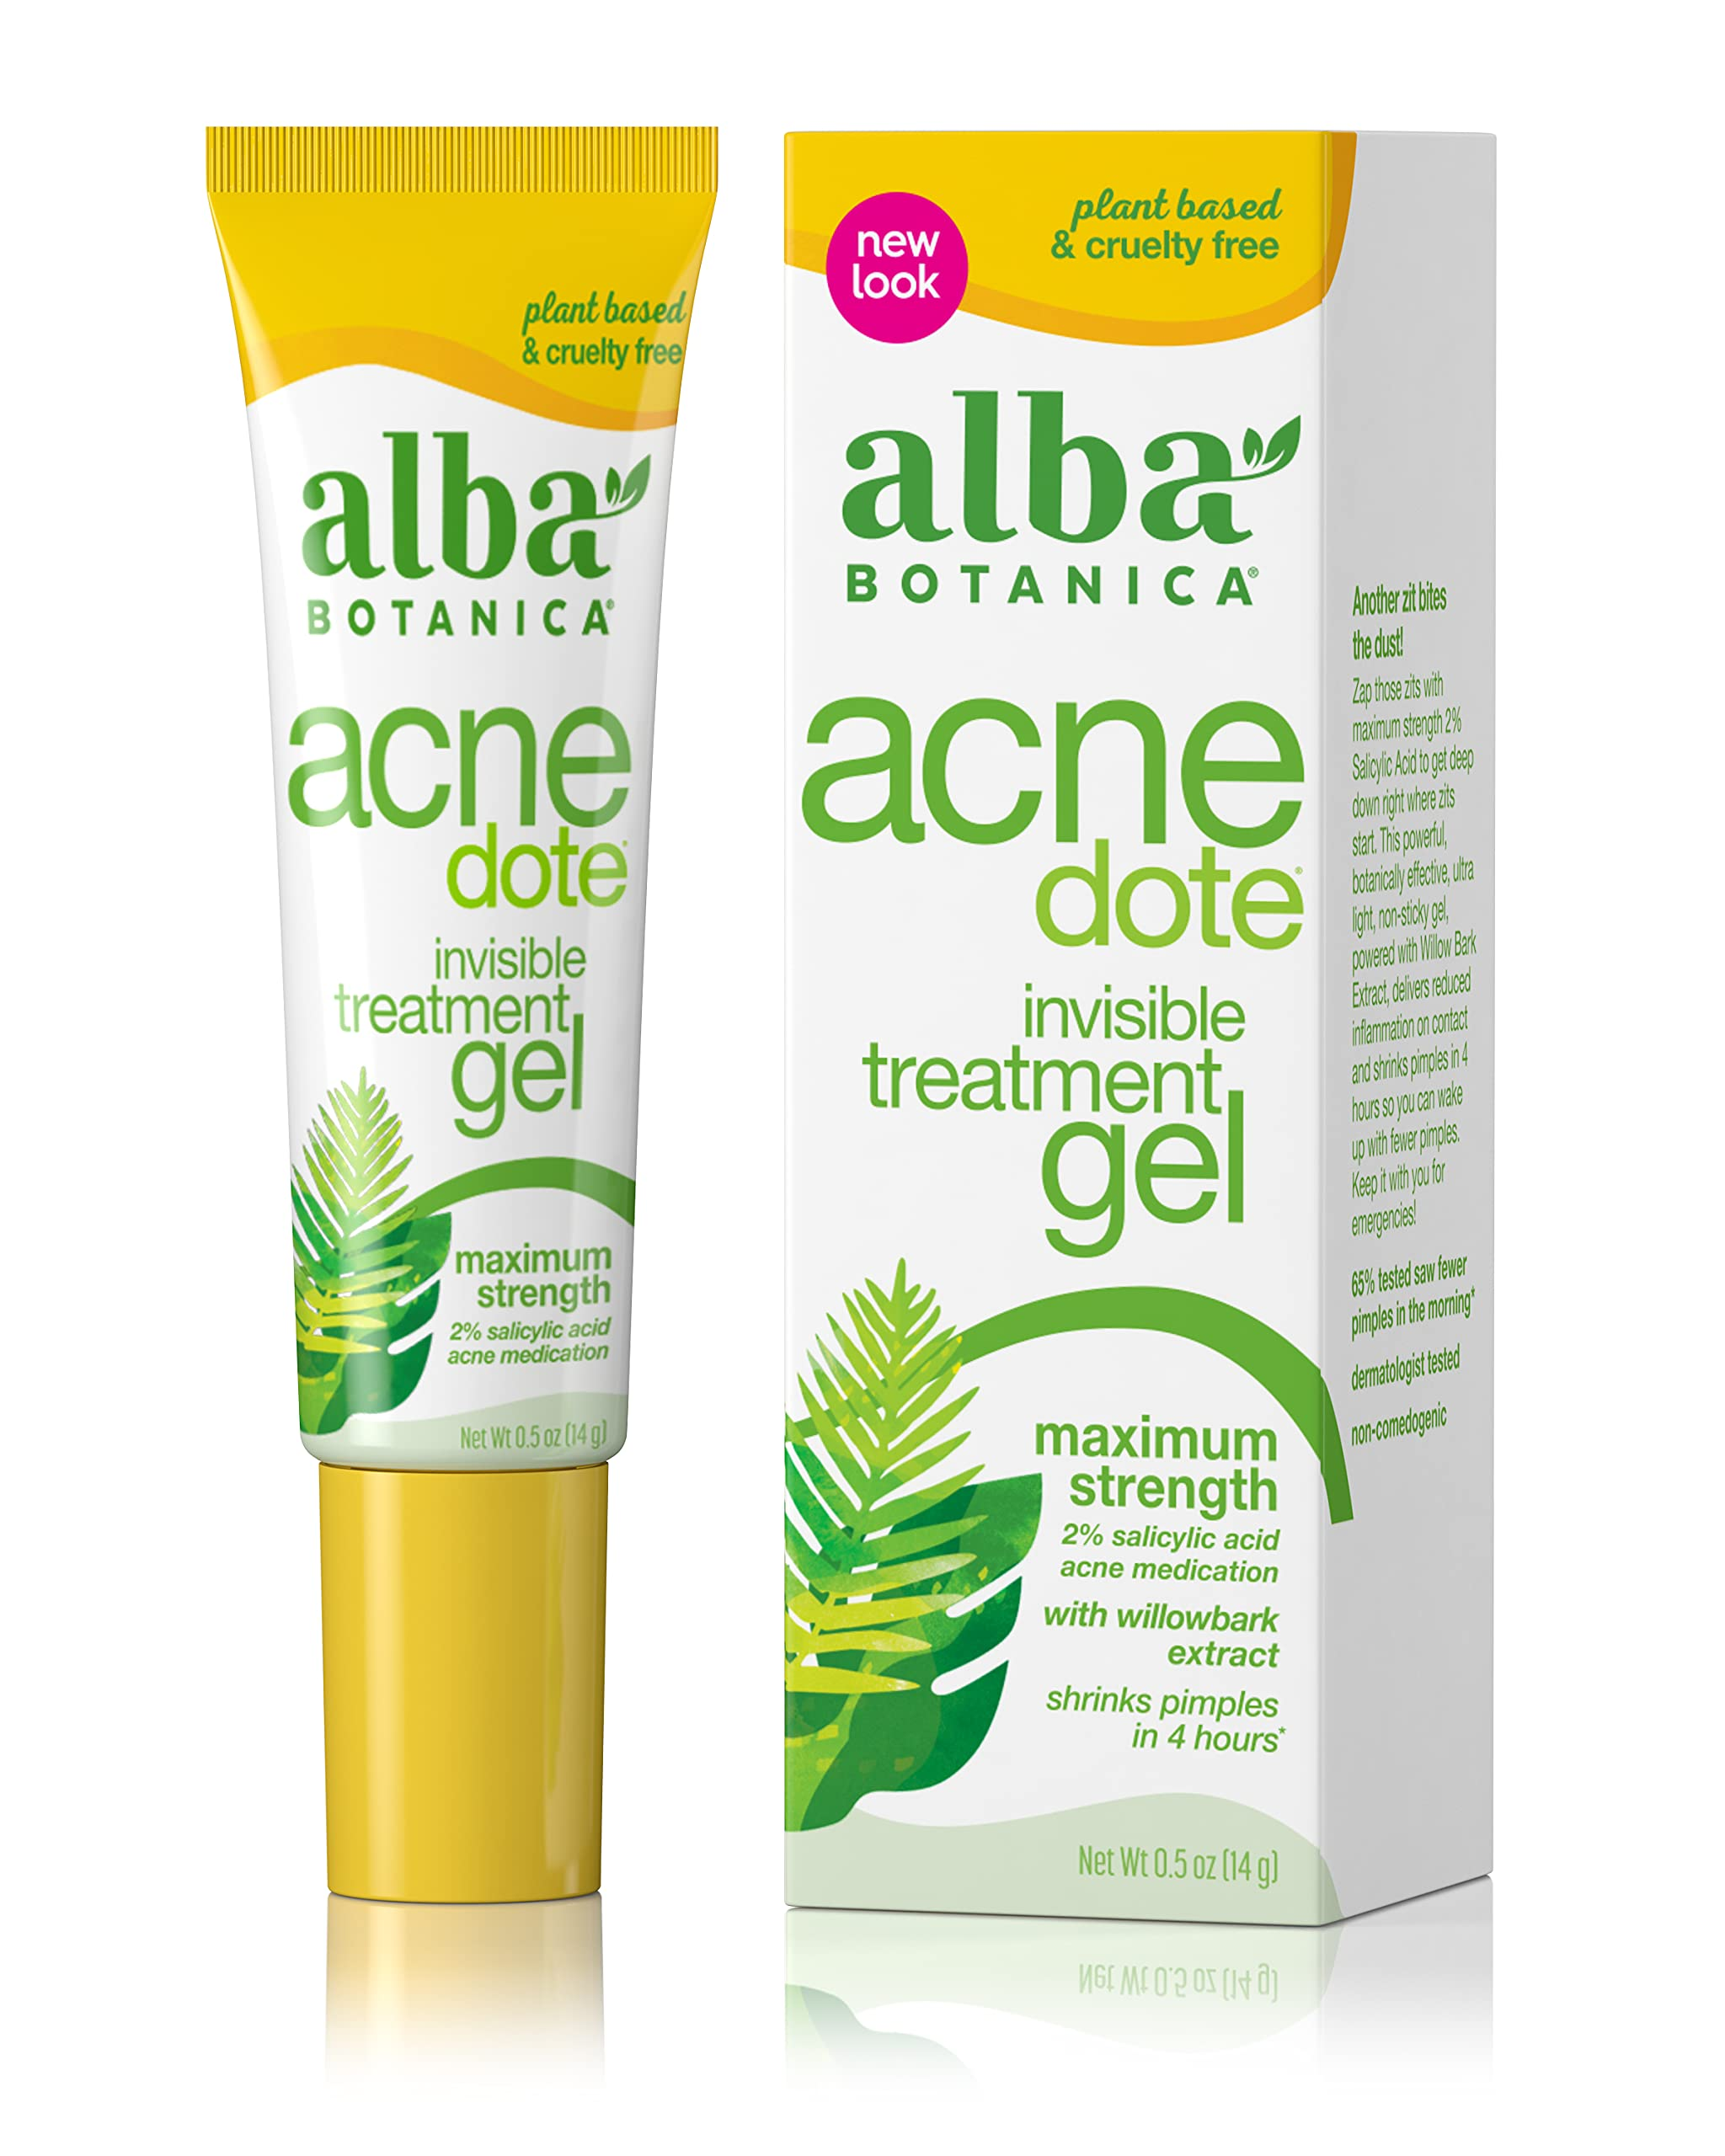 Alba Botanica Acnedote Maximum Strength Oz, Invisible Treatment Gel, 0.5 Ounce